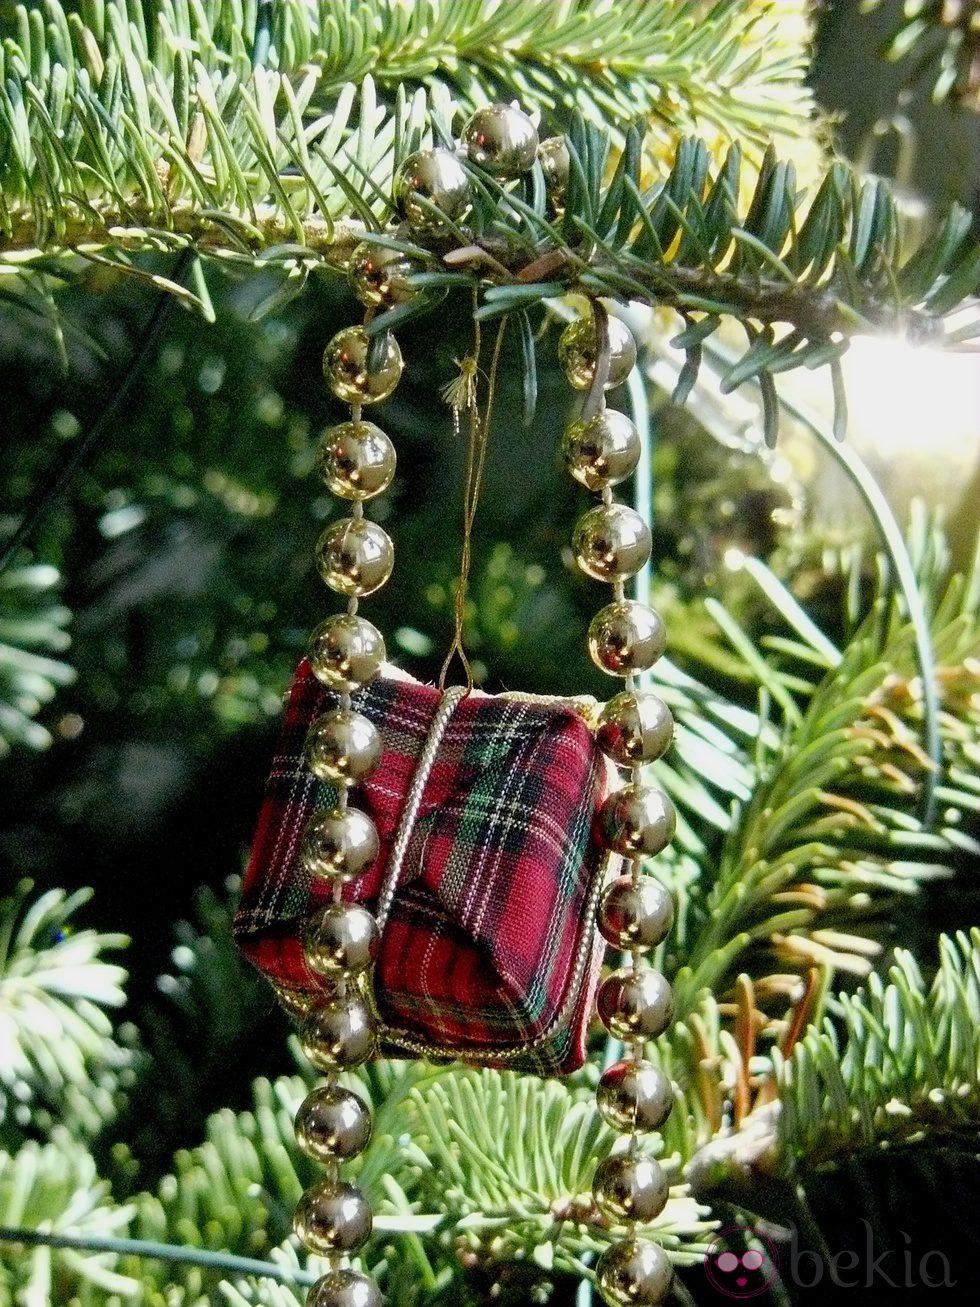 Collares navide os para ni os - Arboles navidad decorados ...